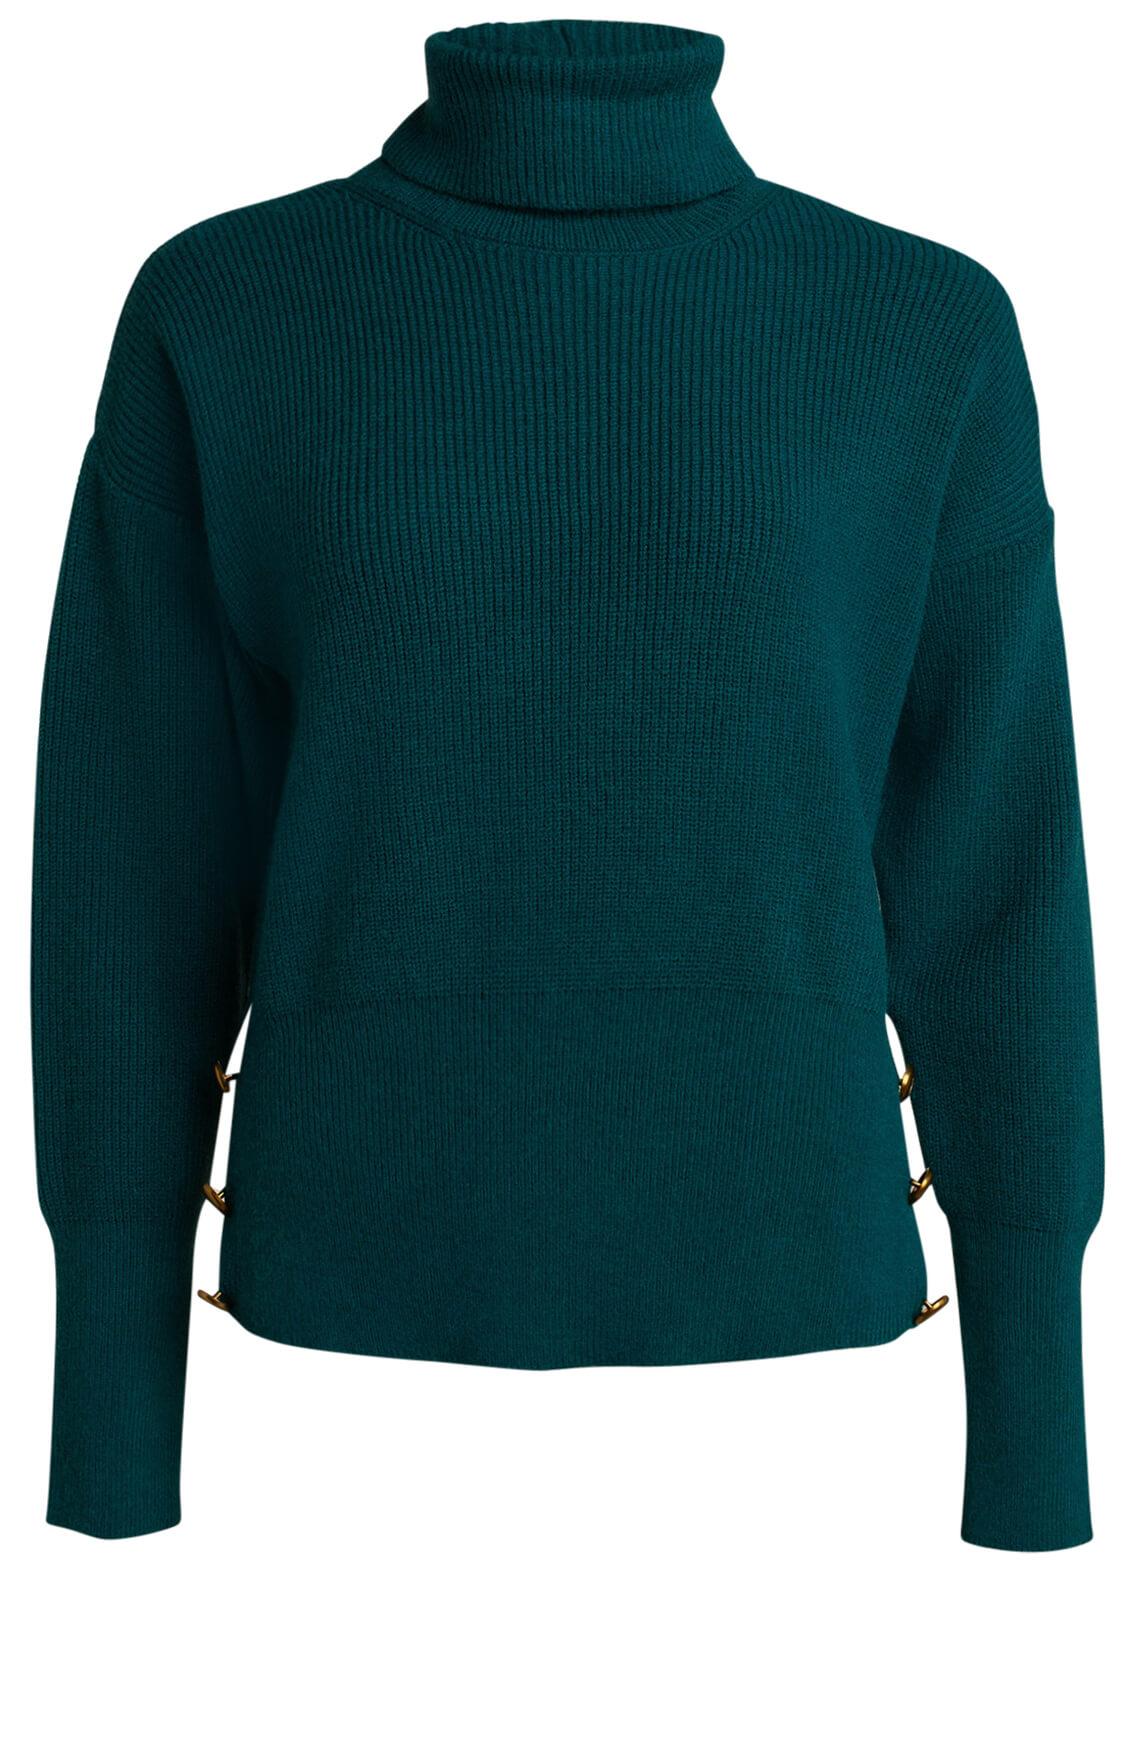 Kocca Dames Ciske pullover groen